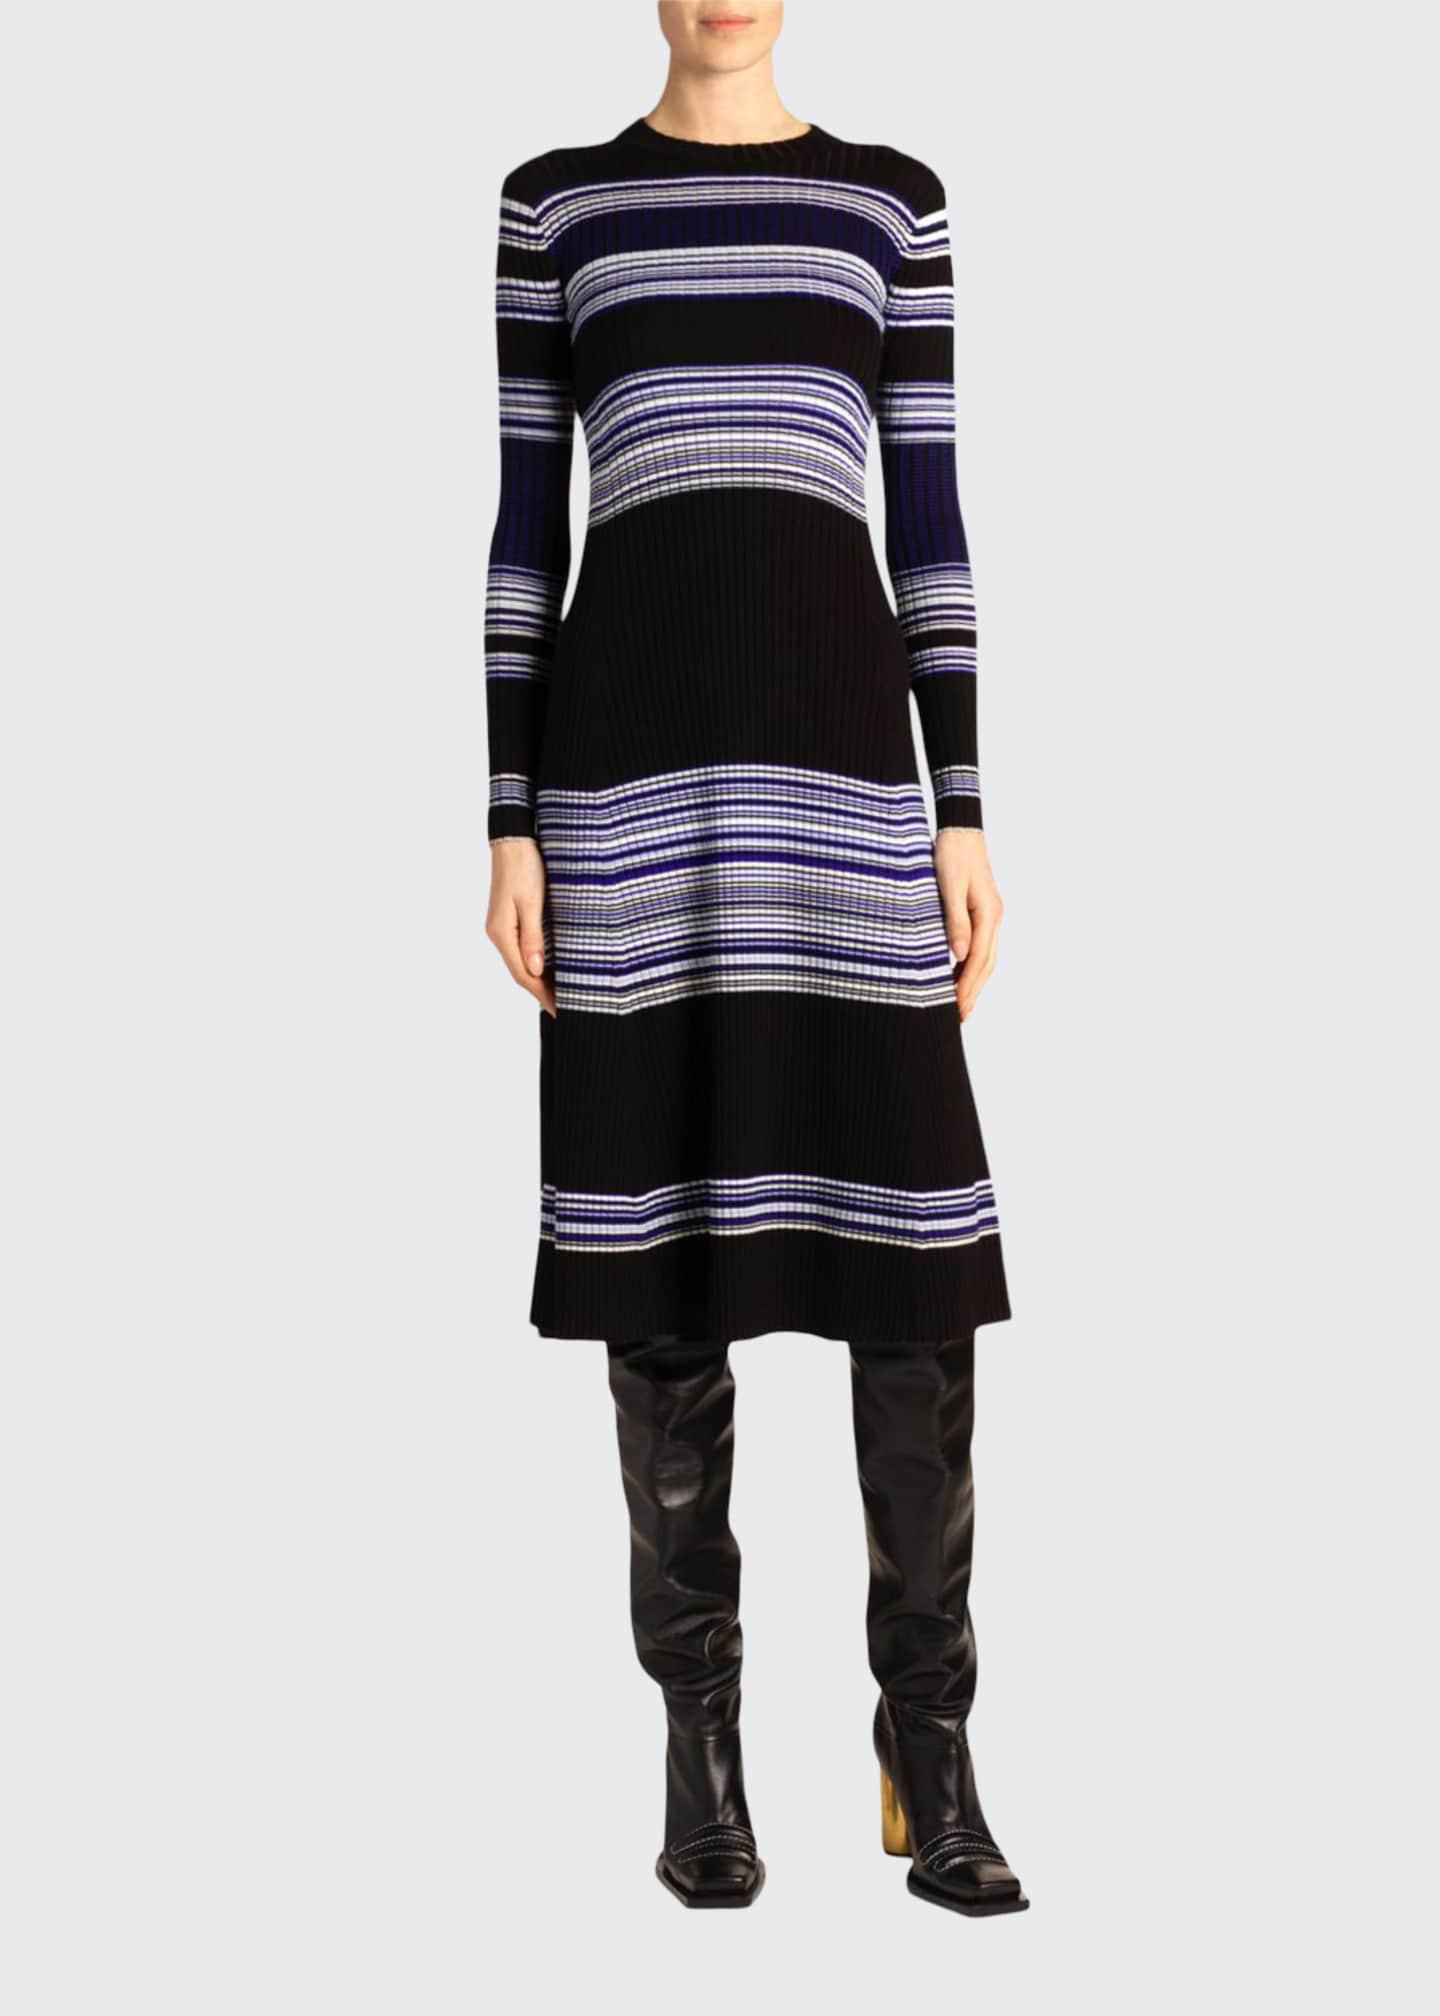 Striped Crewneck Dress by Proenza Schouler